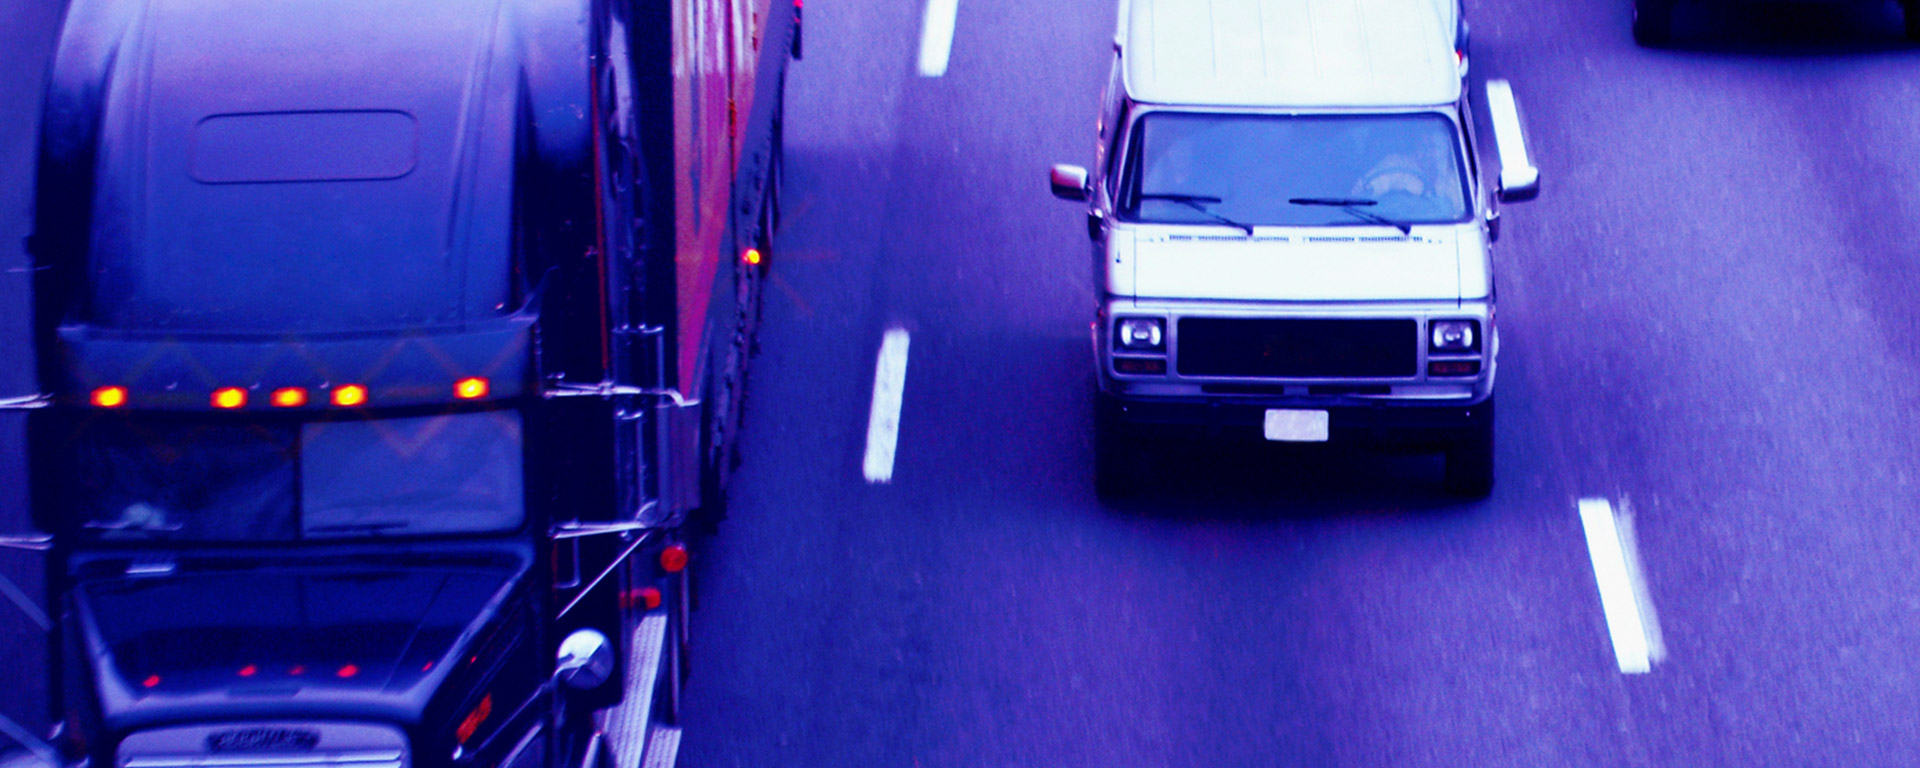 Semi-truck and van driving down freeway